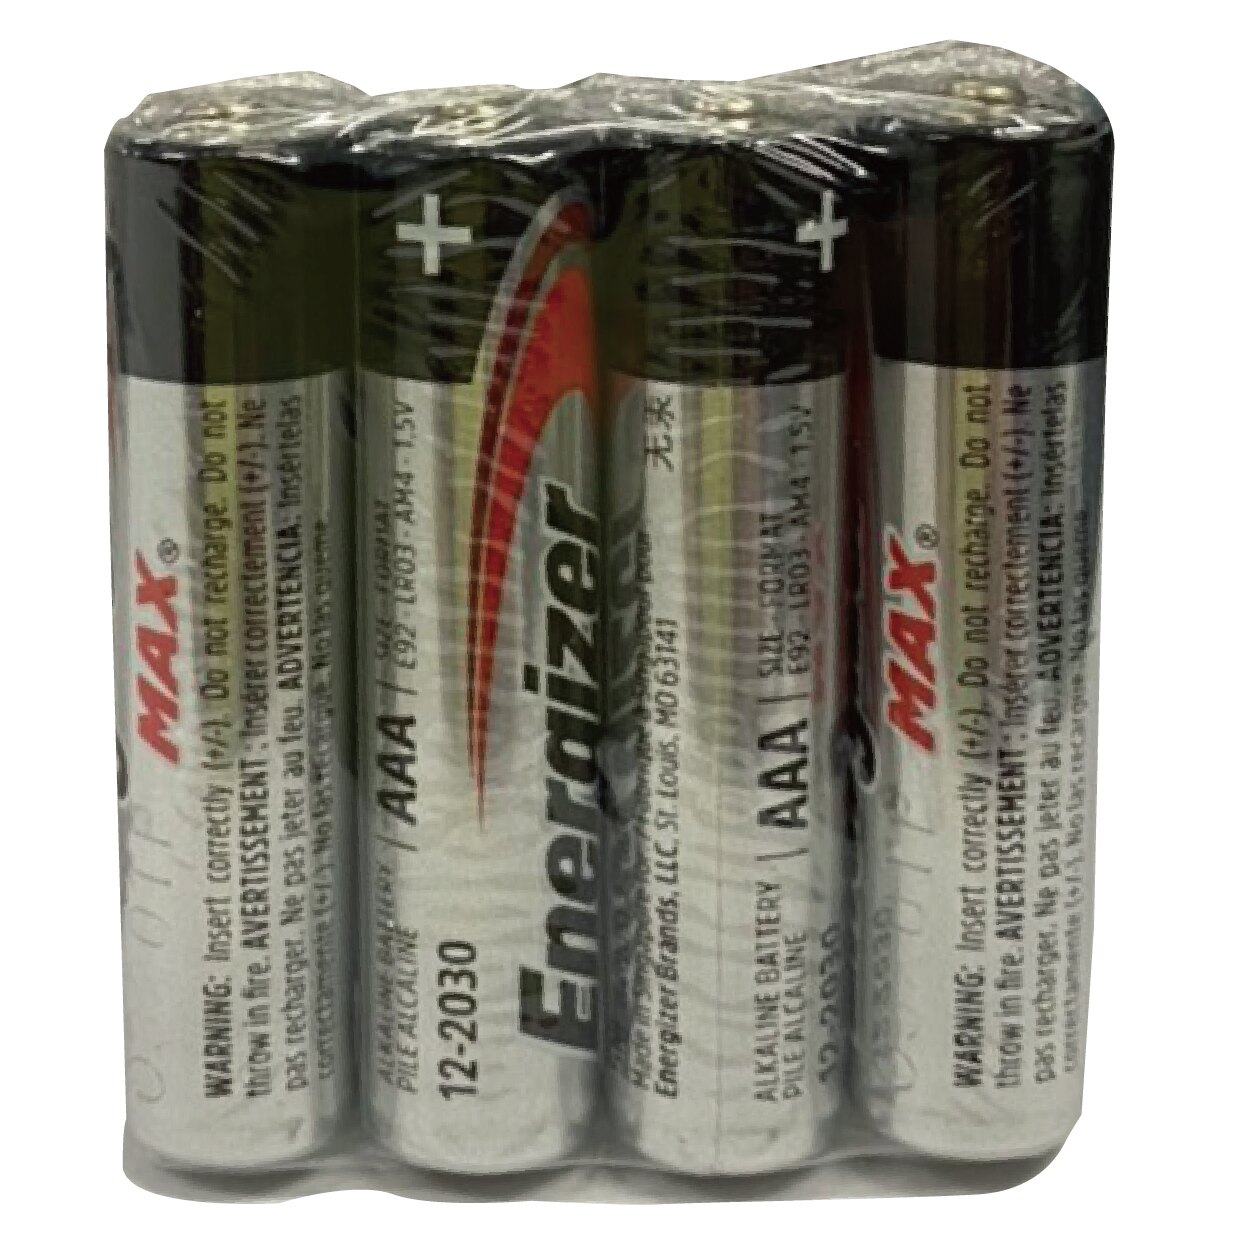 Energizer 勁量 4號 AAA 鹼性電池 40顆入 /盒